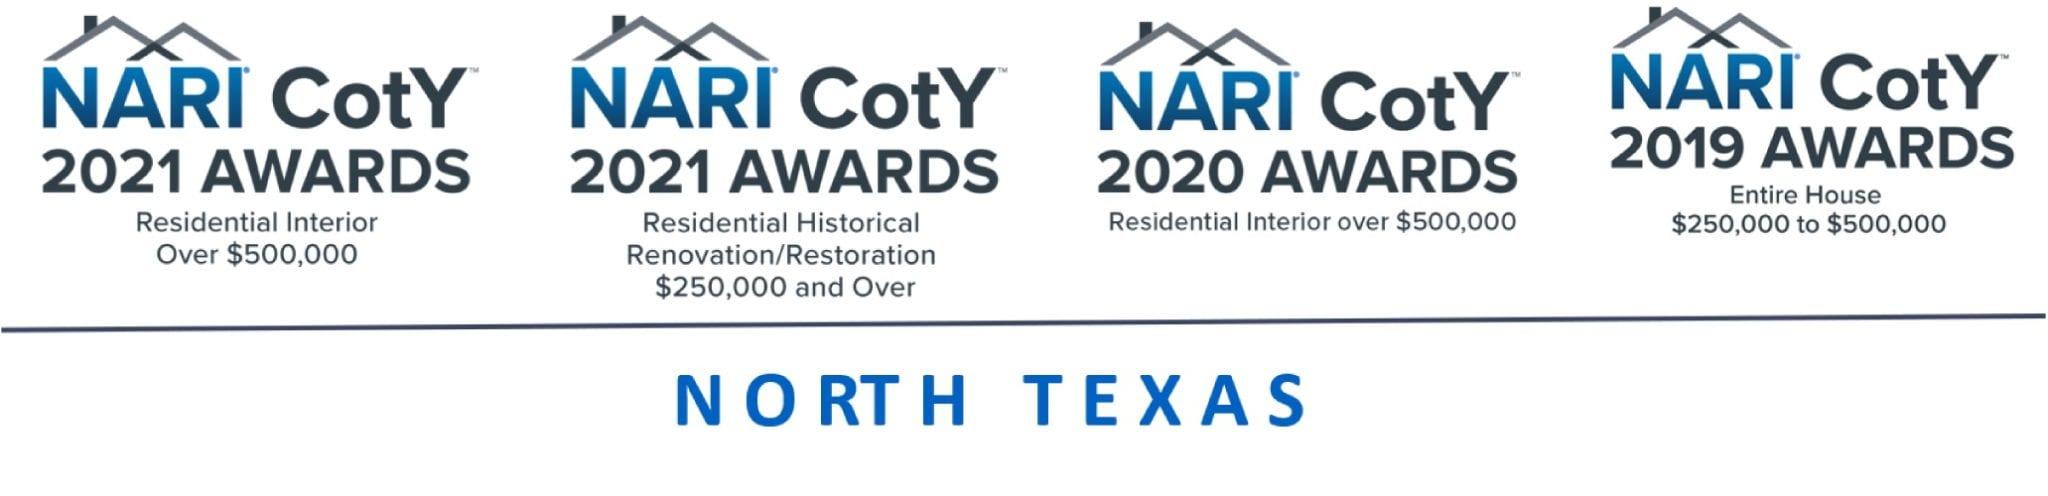 Award Winning Dallas Remodeling